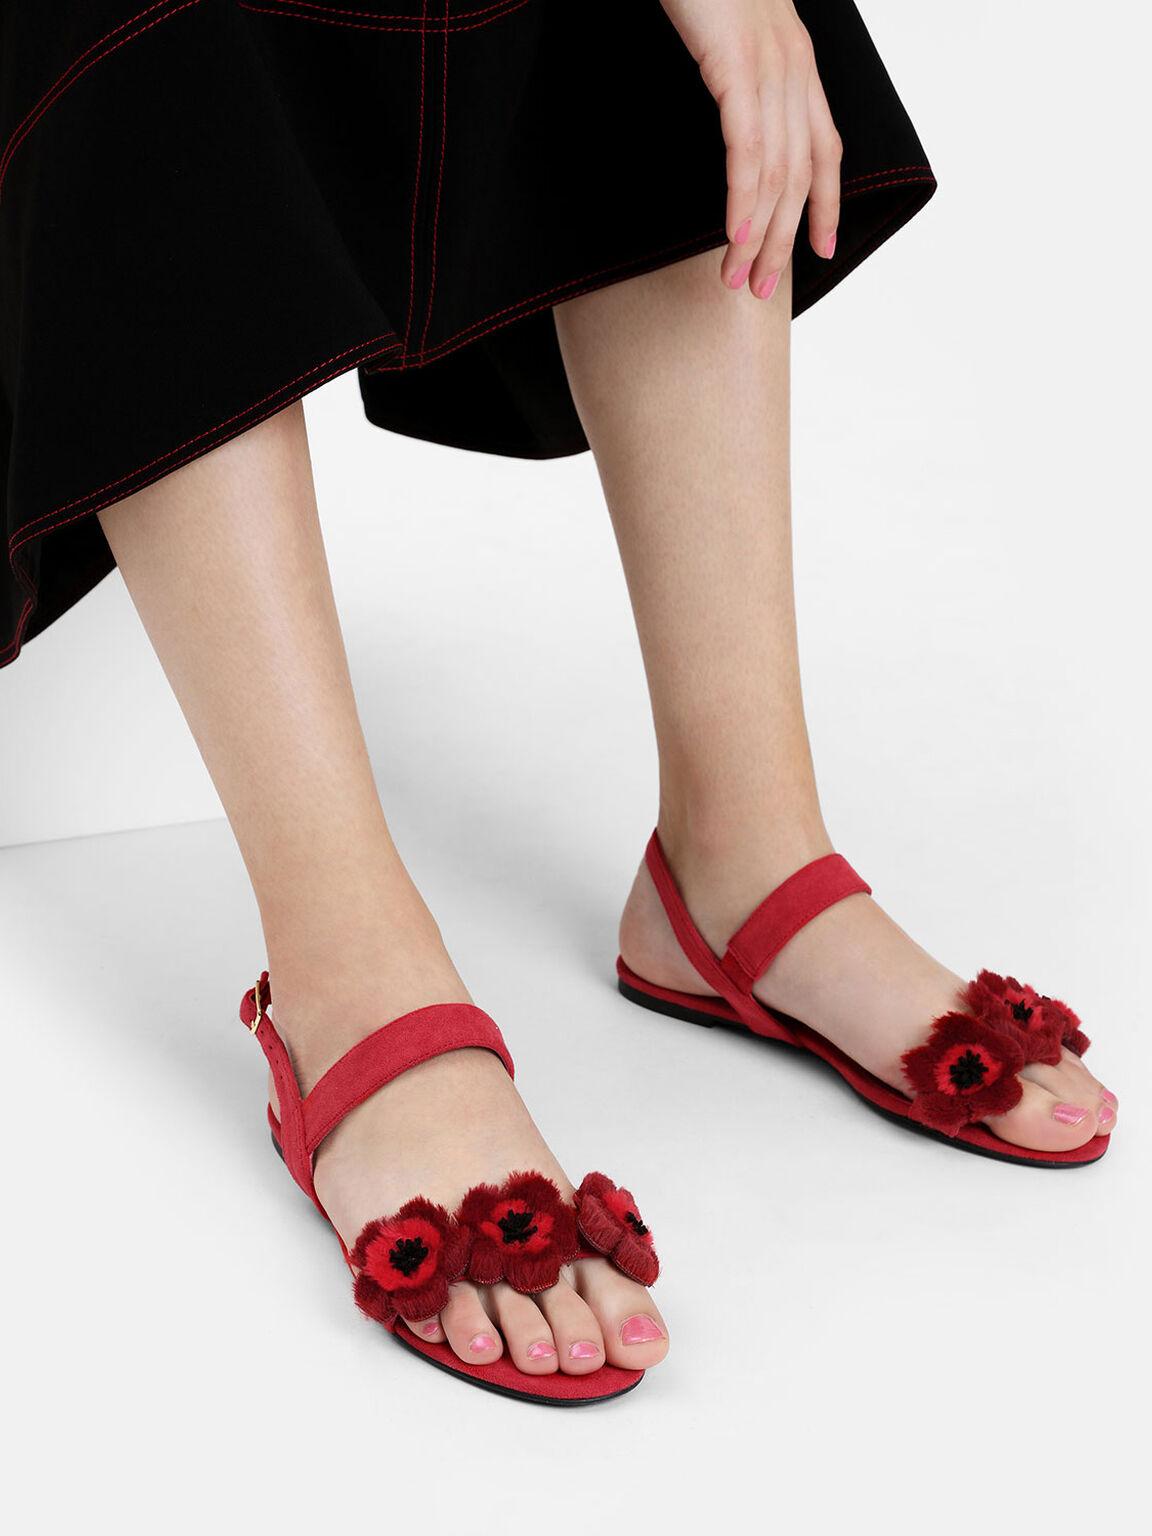 絨毛花朵涼鞋, 紅色, hi-res